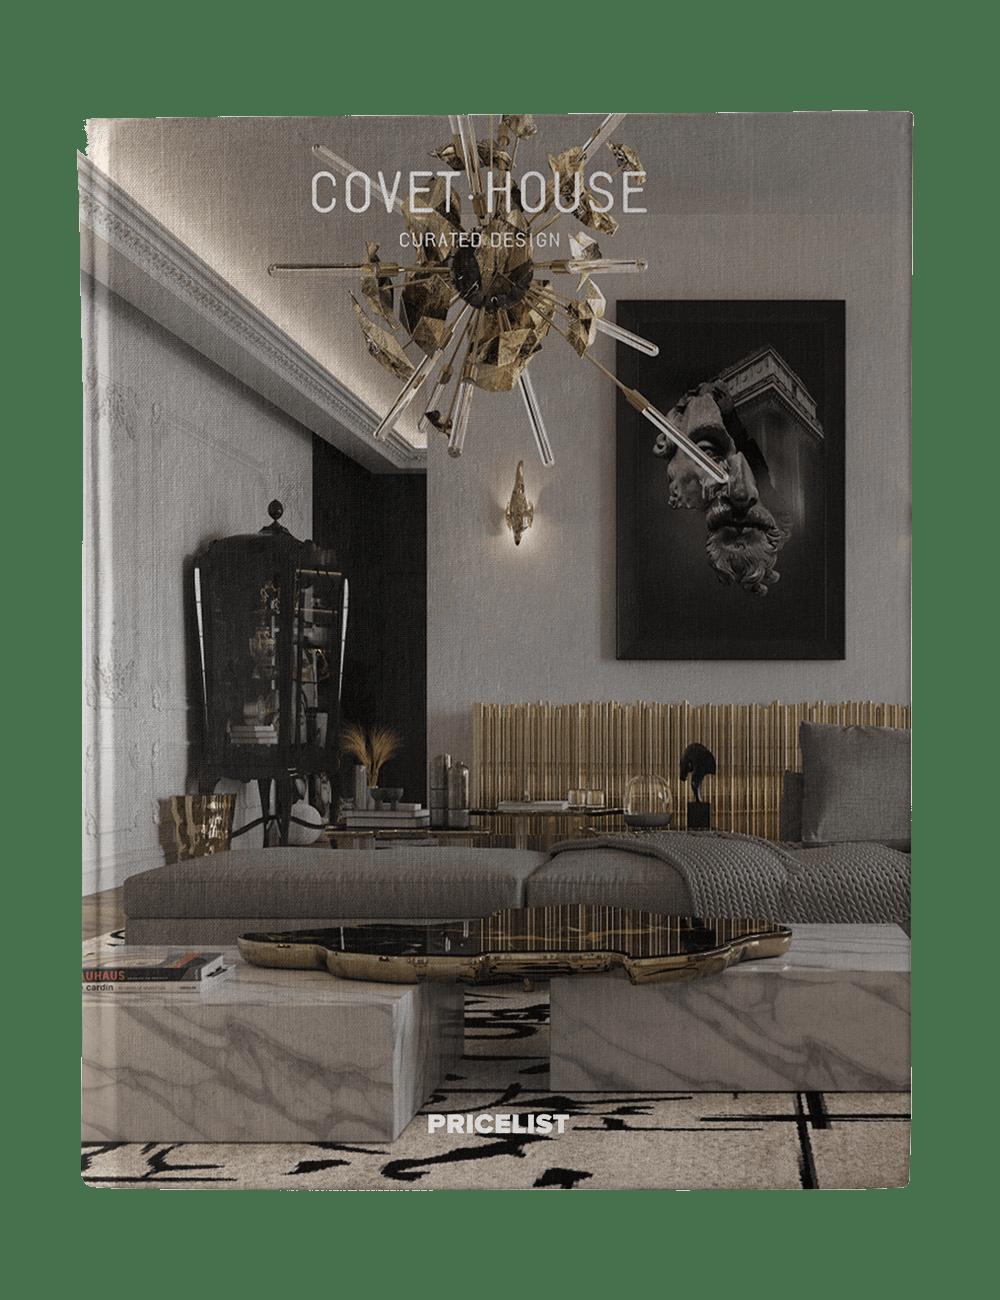 pricelist - multi-million-dollar-parisian-penthouse-boca-do-lobo